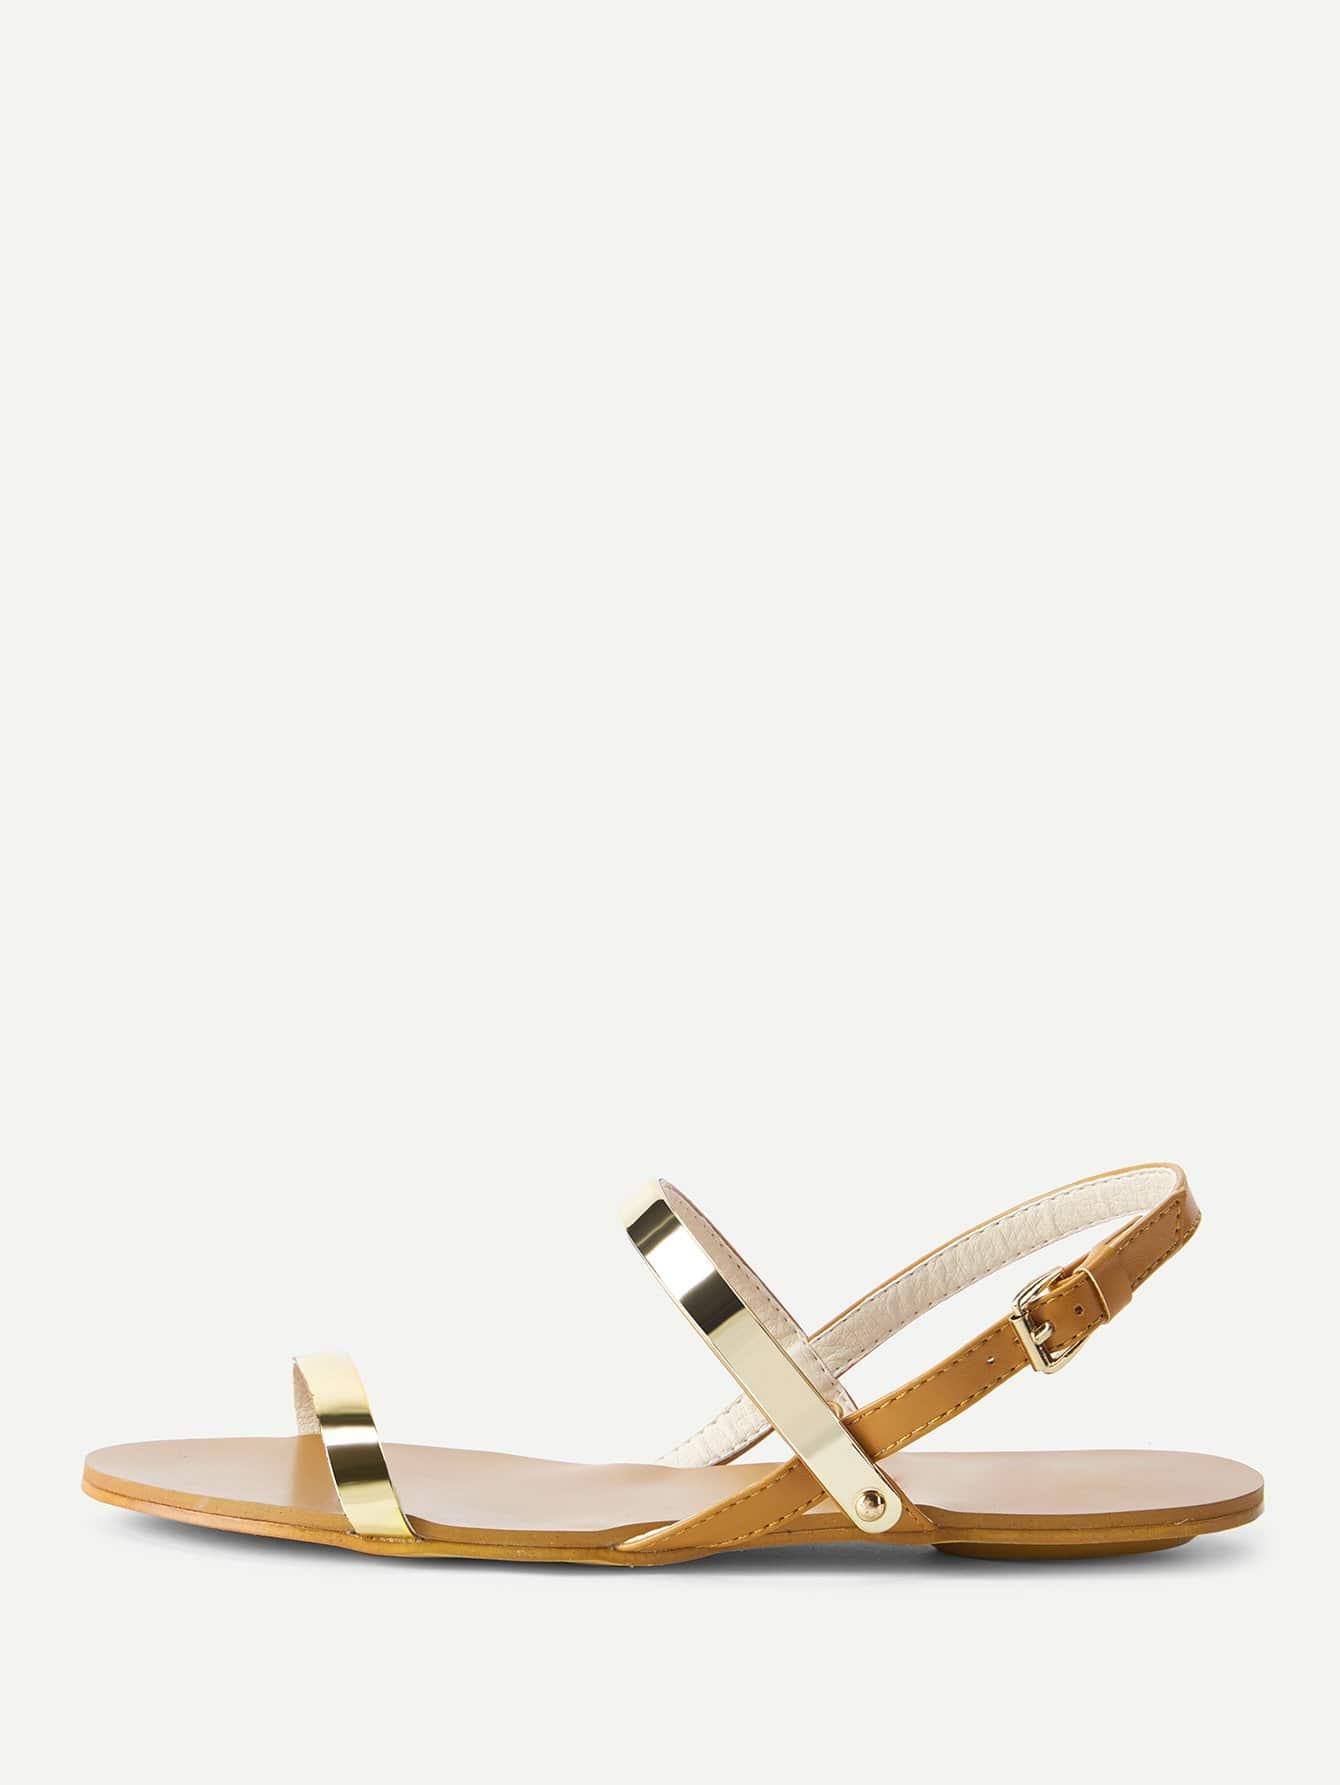 PU Strappy Flat Sandals metallic strappy flat sandals